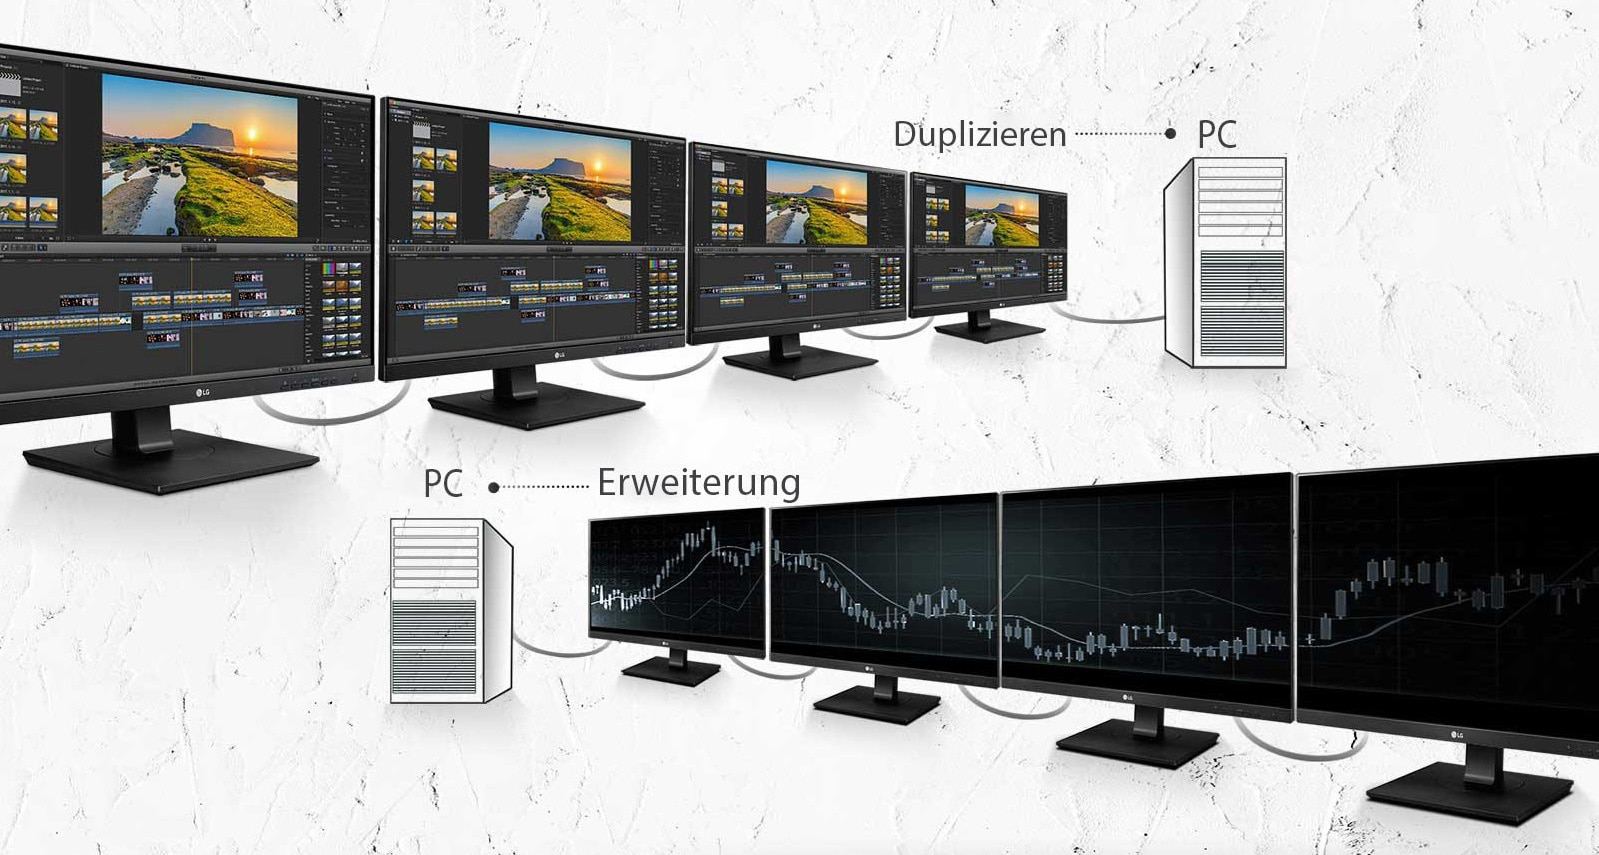 duplizieren bildschirm windows 10